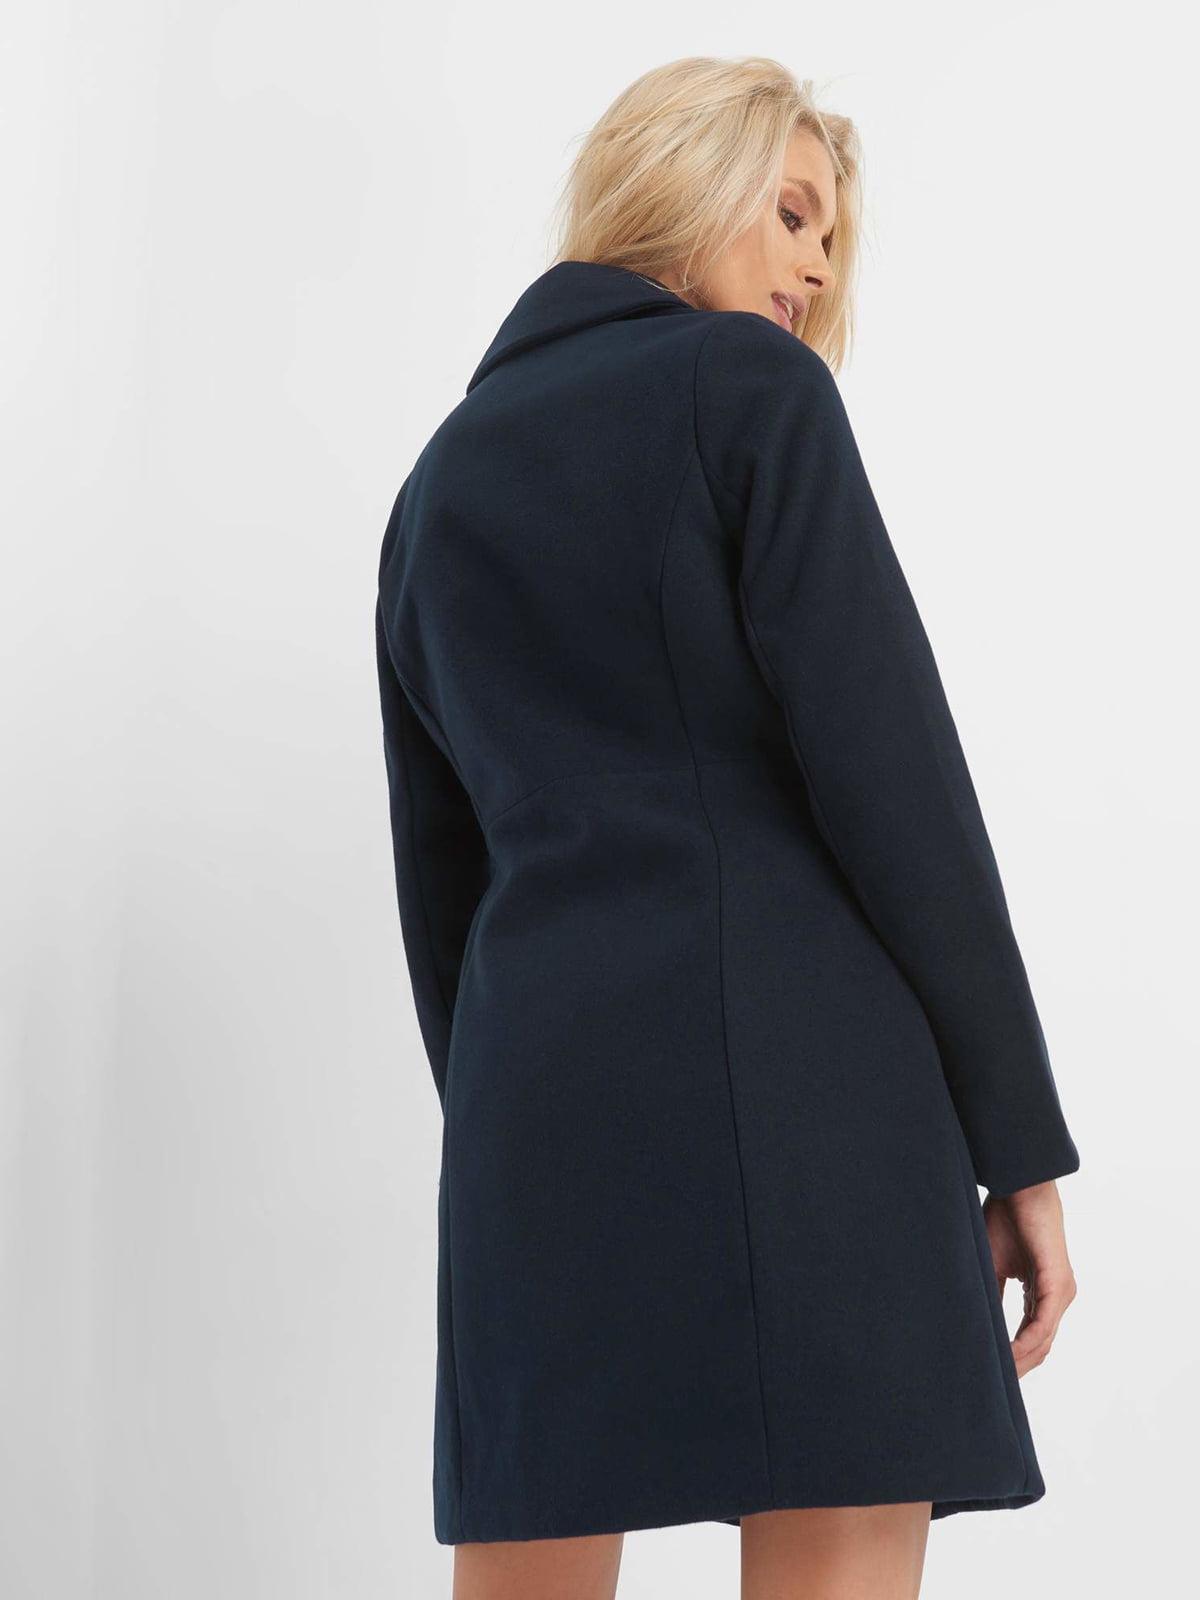 Пальто синє | 4677712 | фото 11